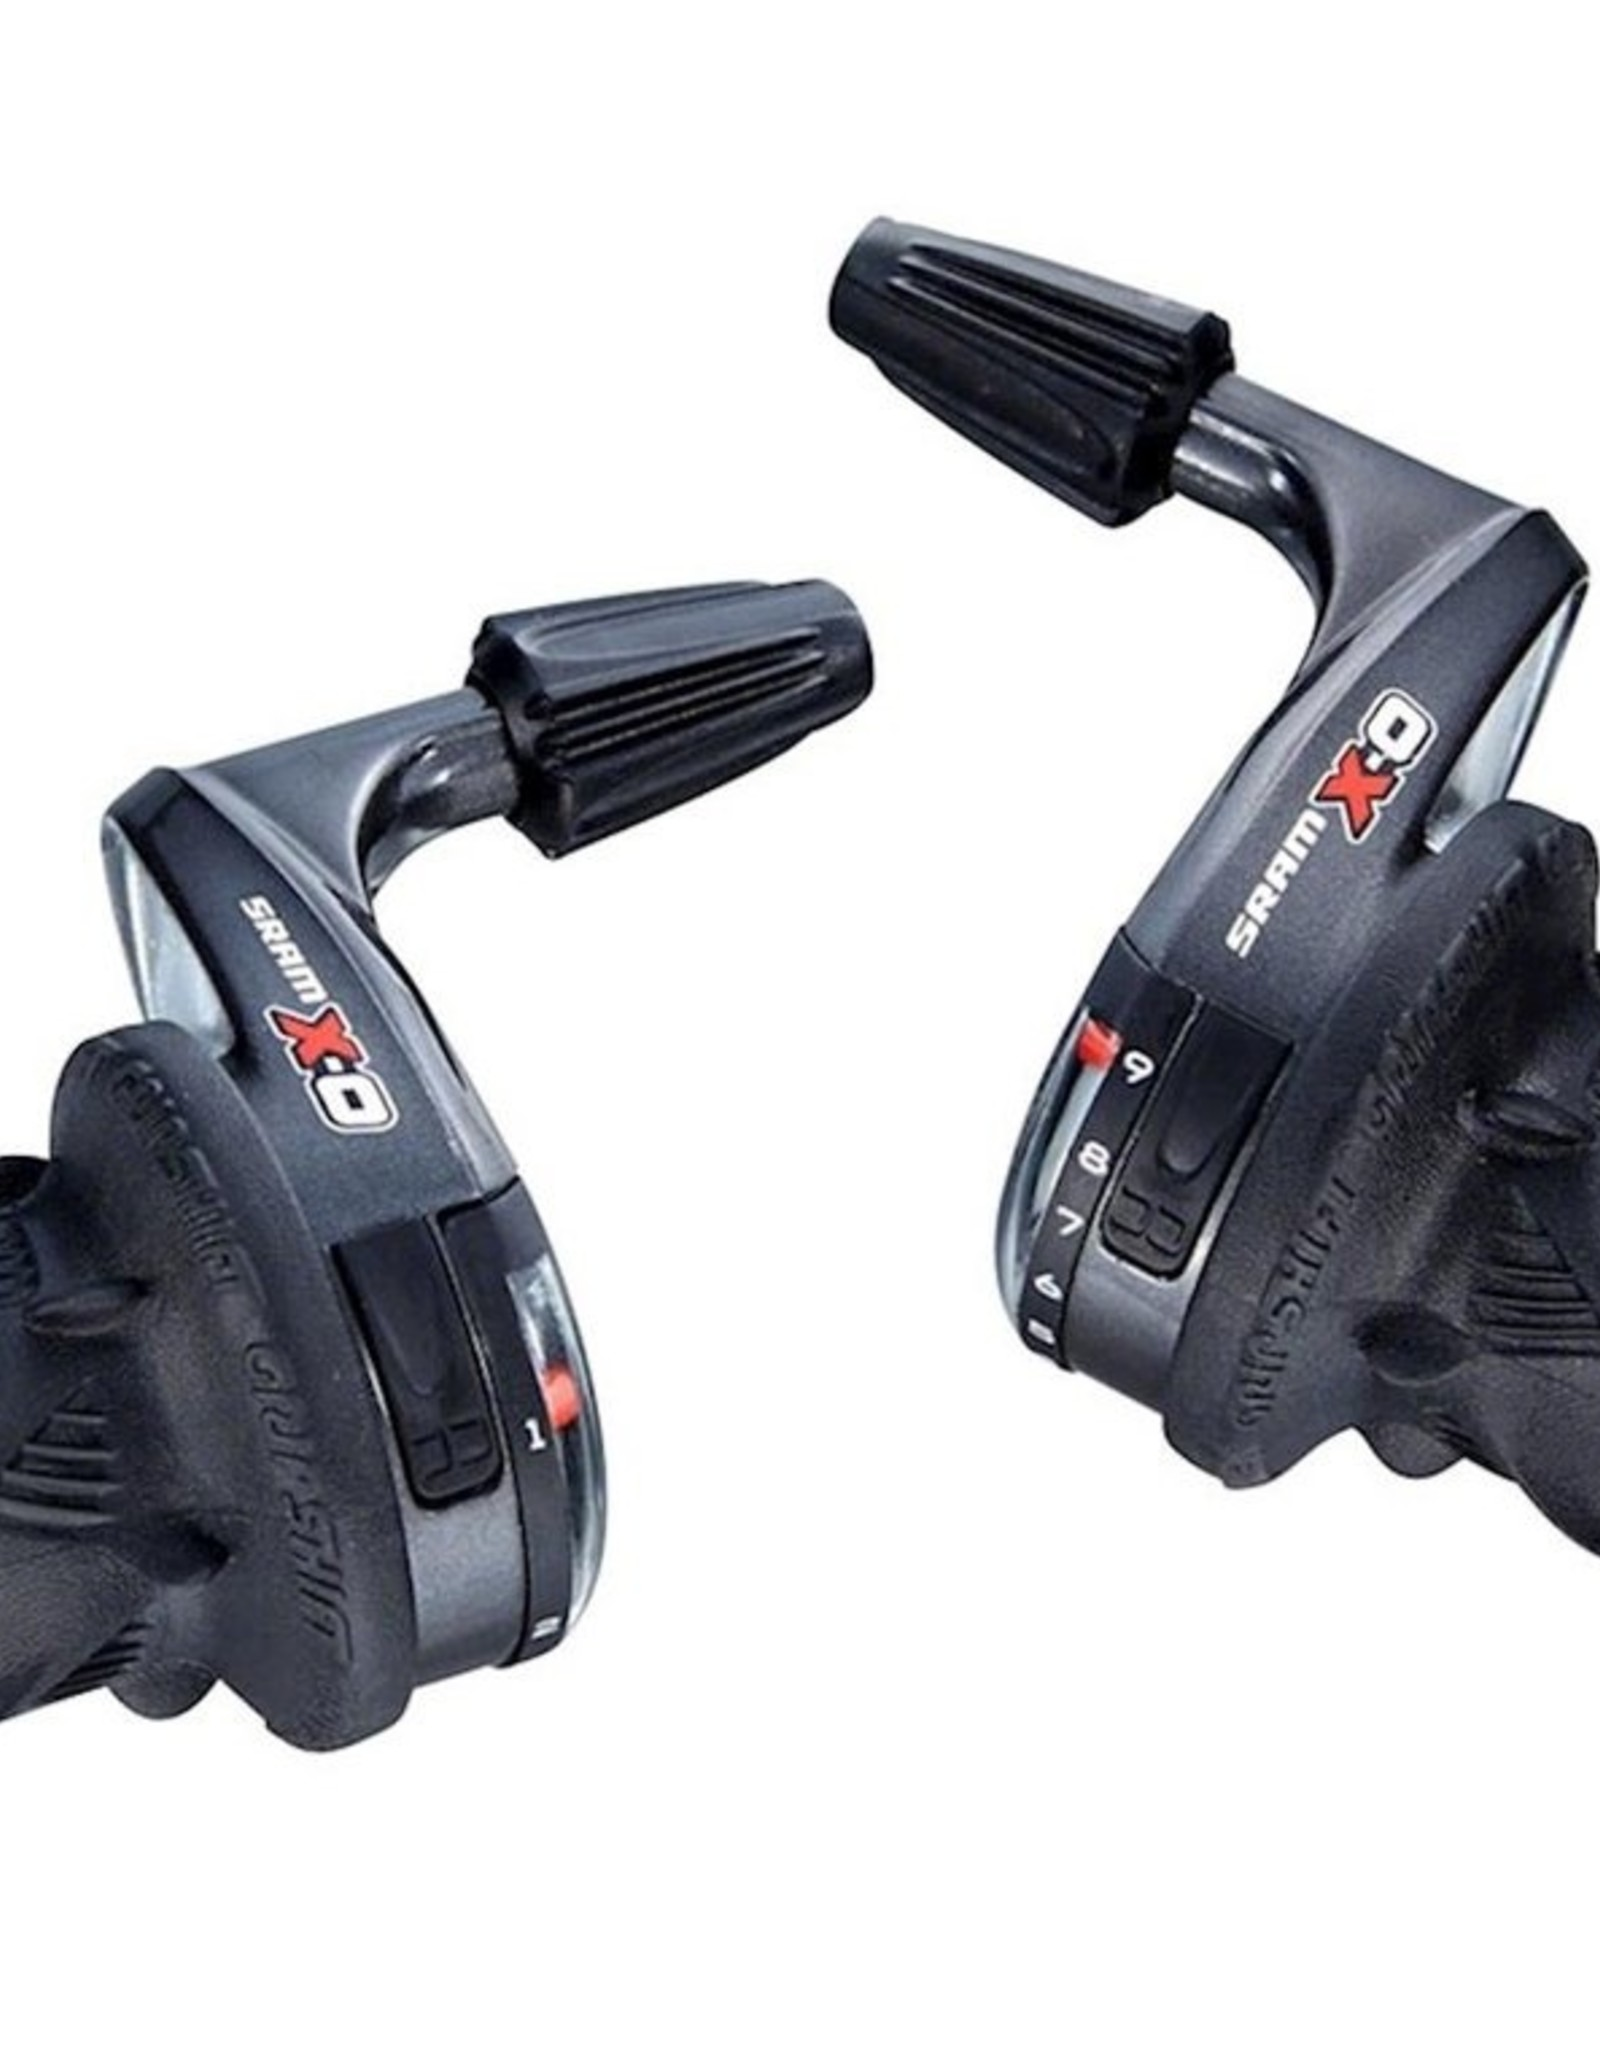 SRAM X0 3 x 9 Speed Twist Shifter Set, Left Shifter is Microfriction